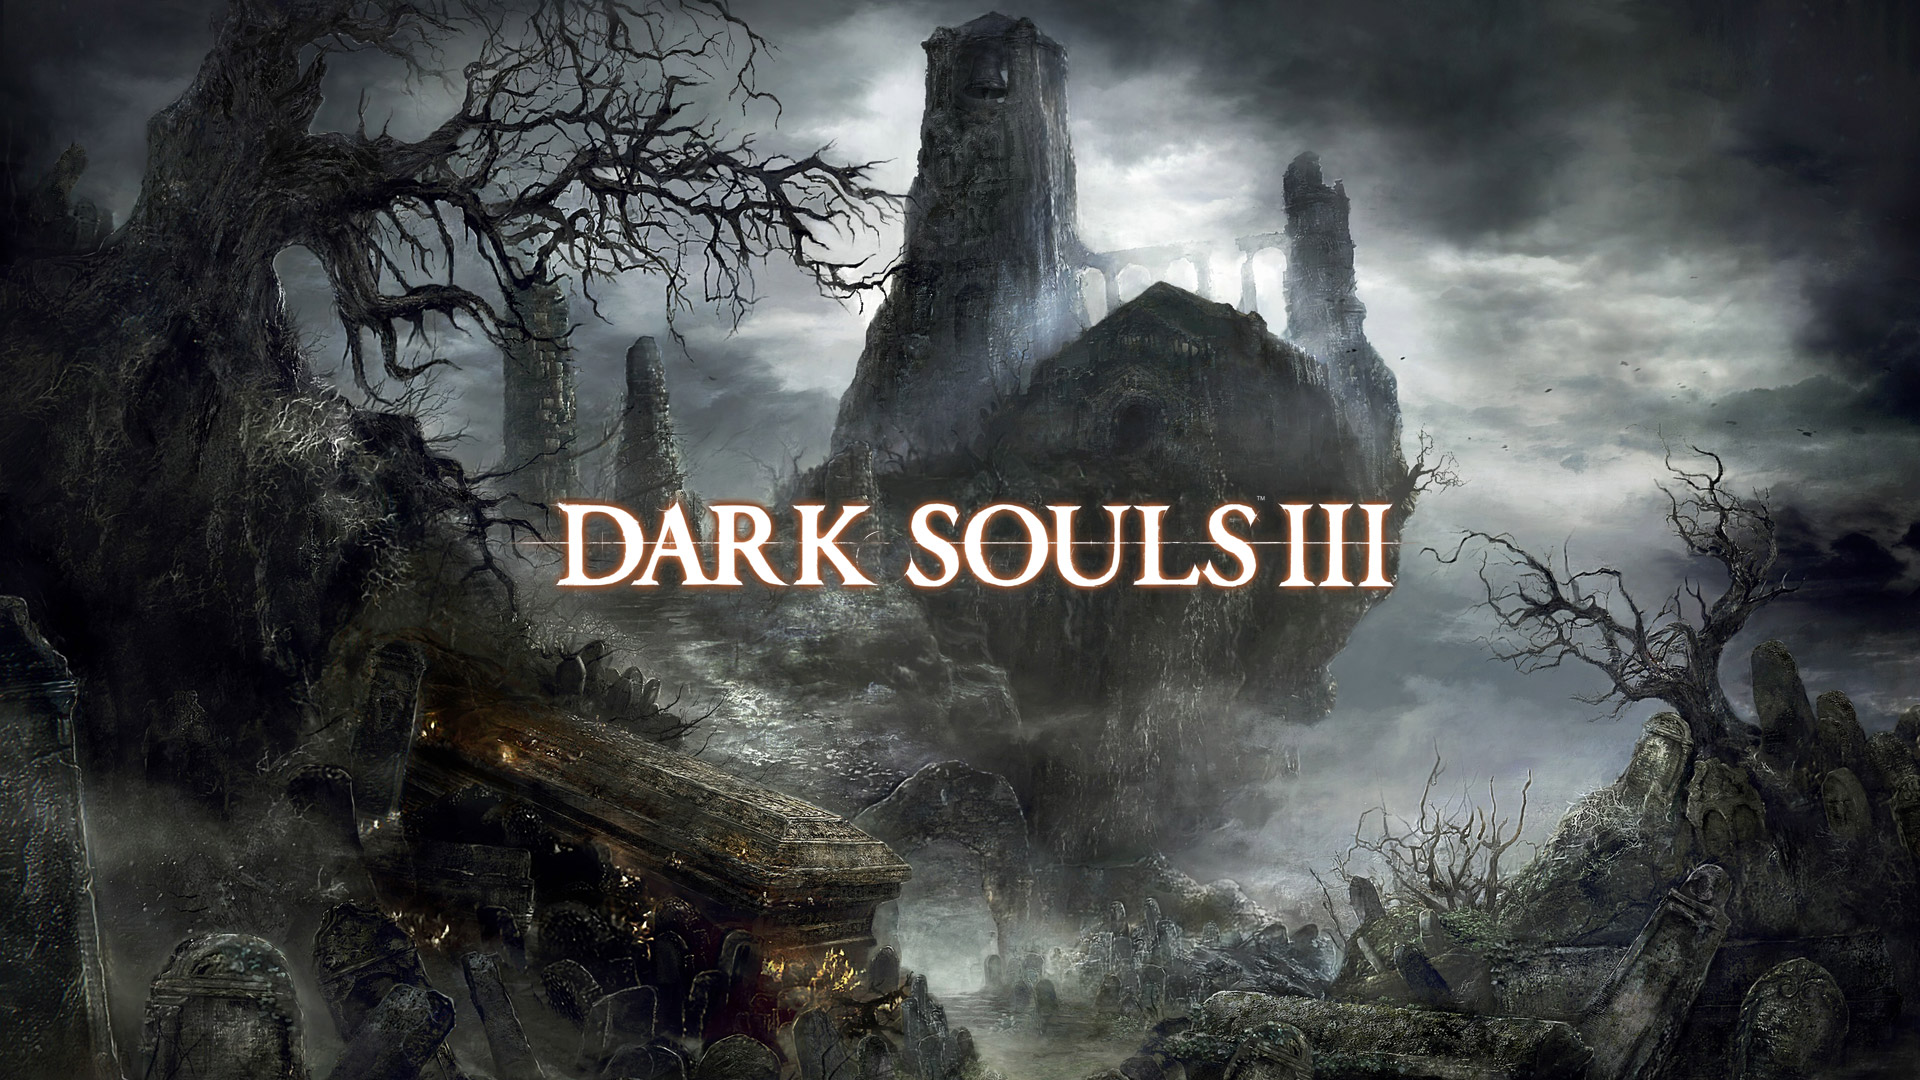 Dark Souls III Wallpaper in 1920x1080